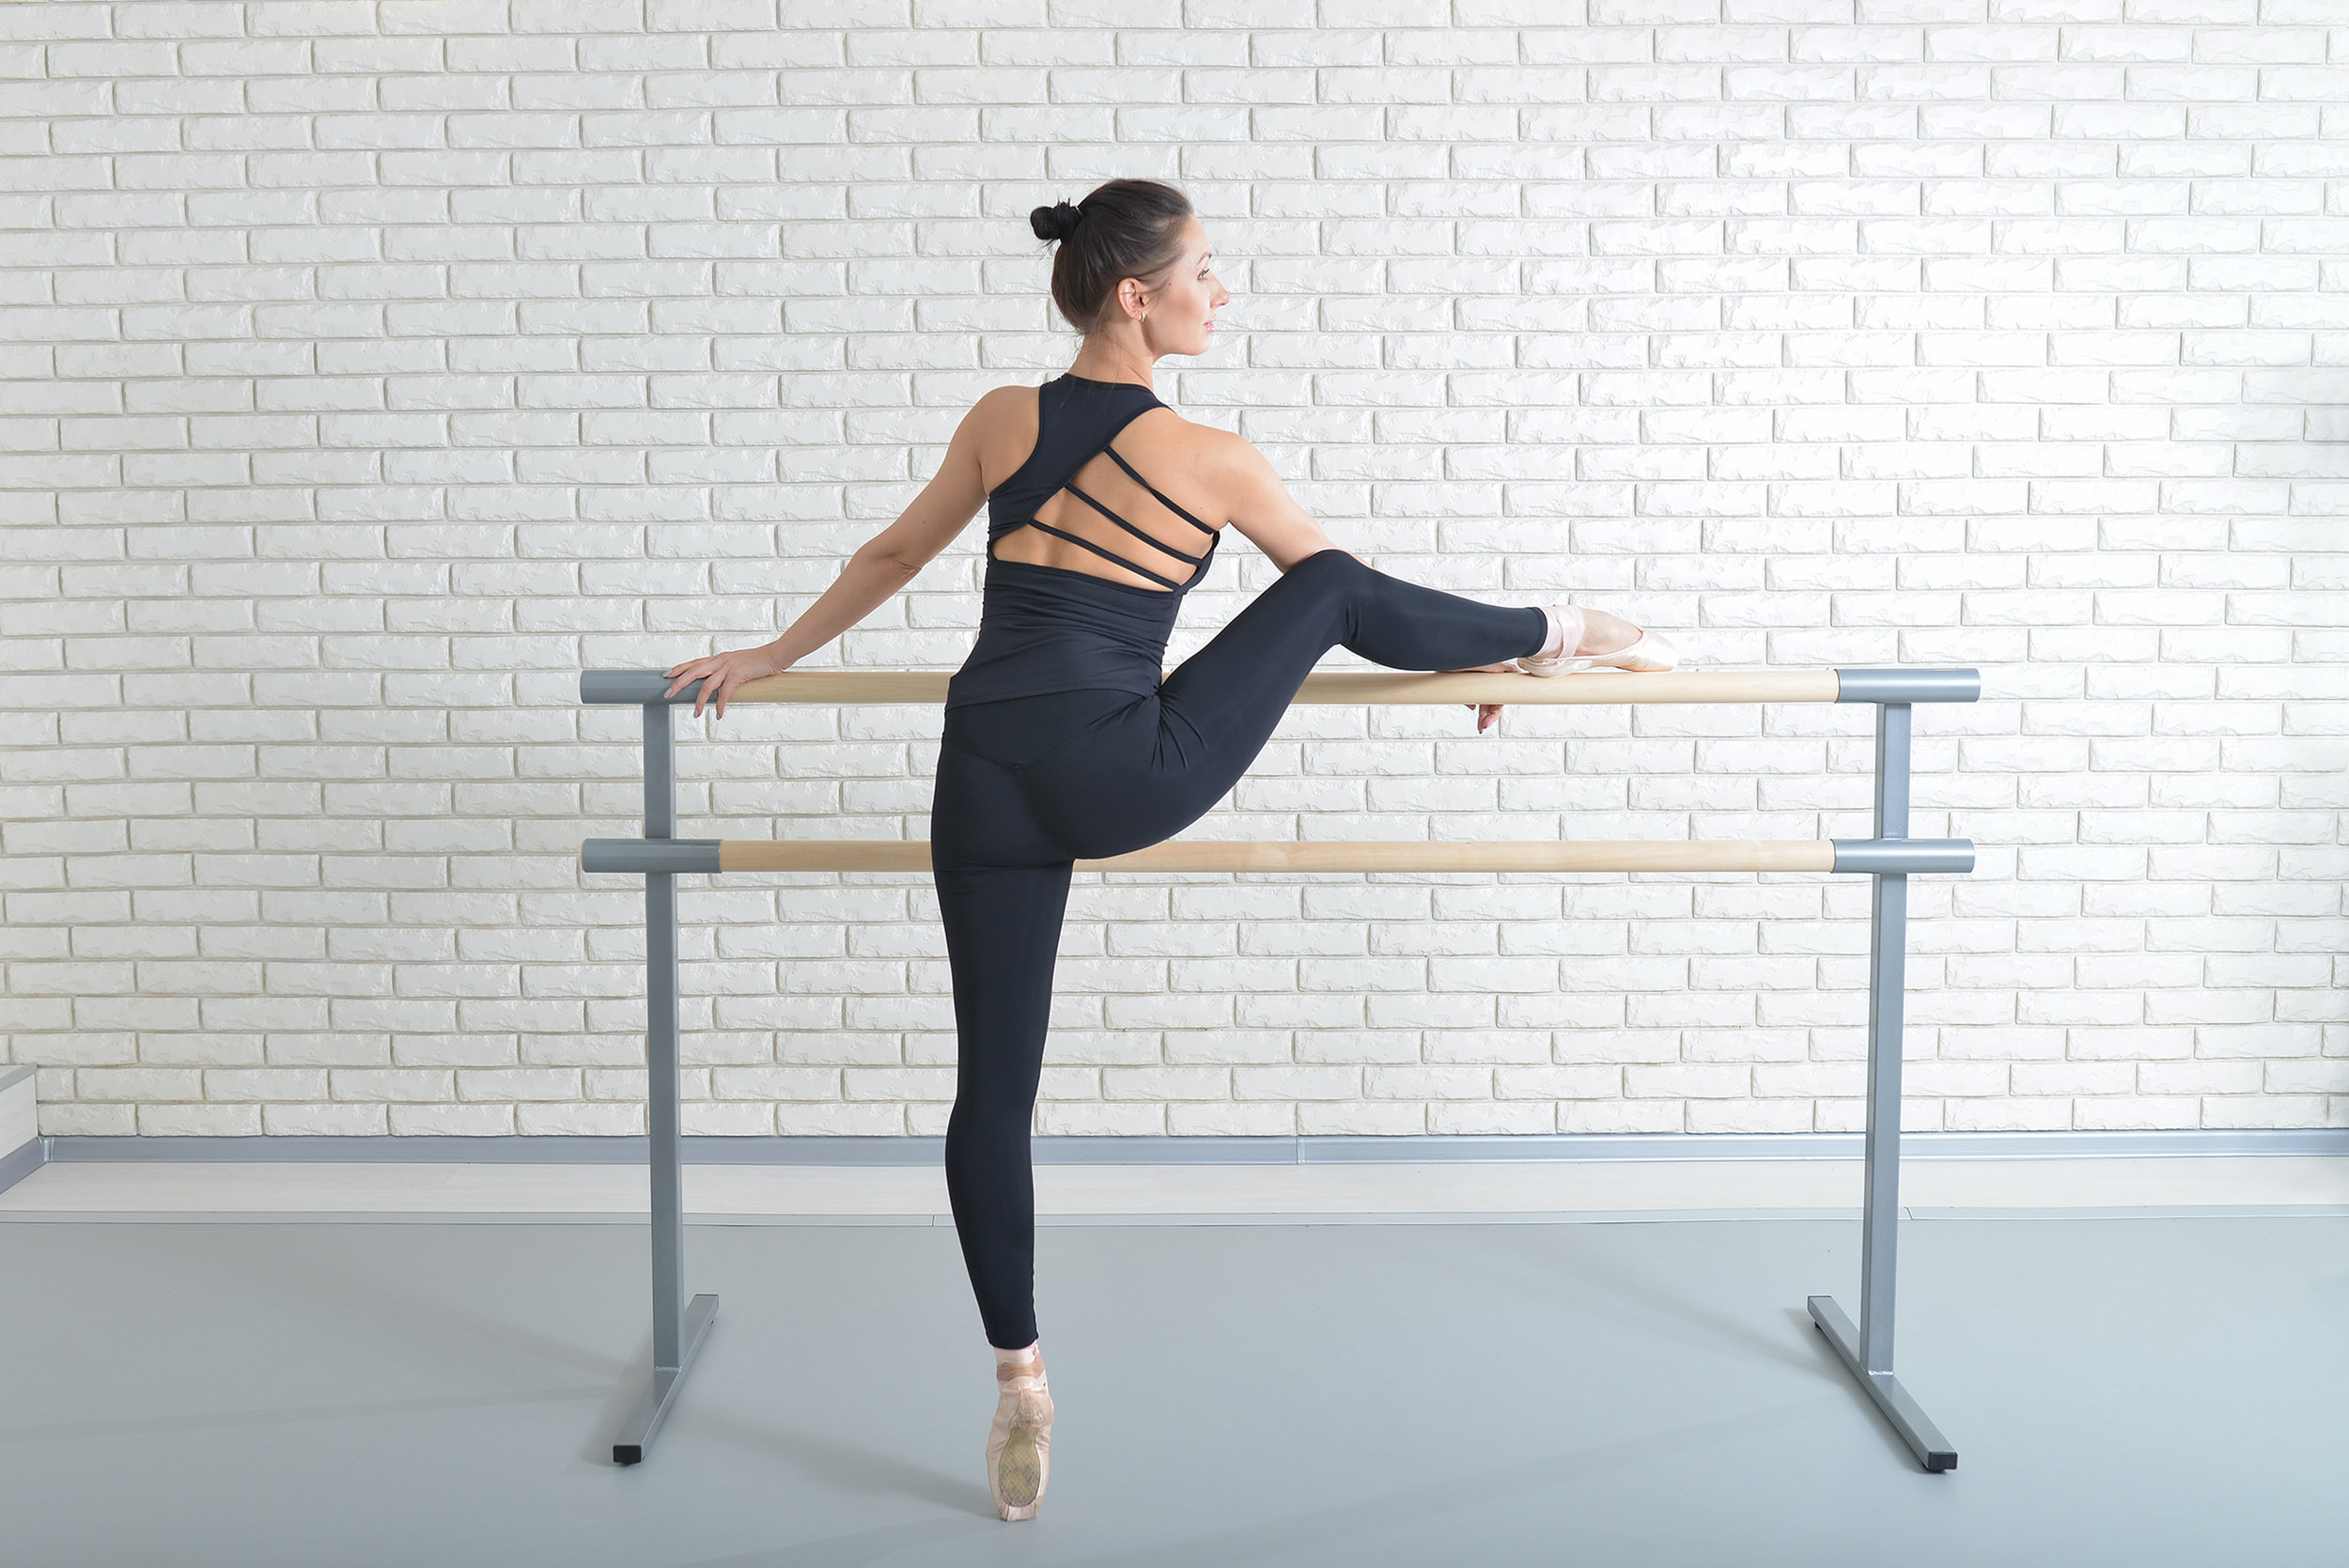 Ballerina-stretches-herself-near-barre-at-ballet-studio,-full-length-portrait.-863913310_3000x2003.jpeg